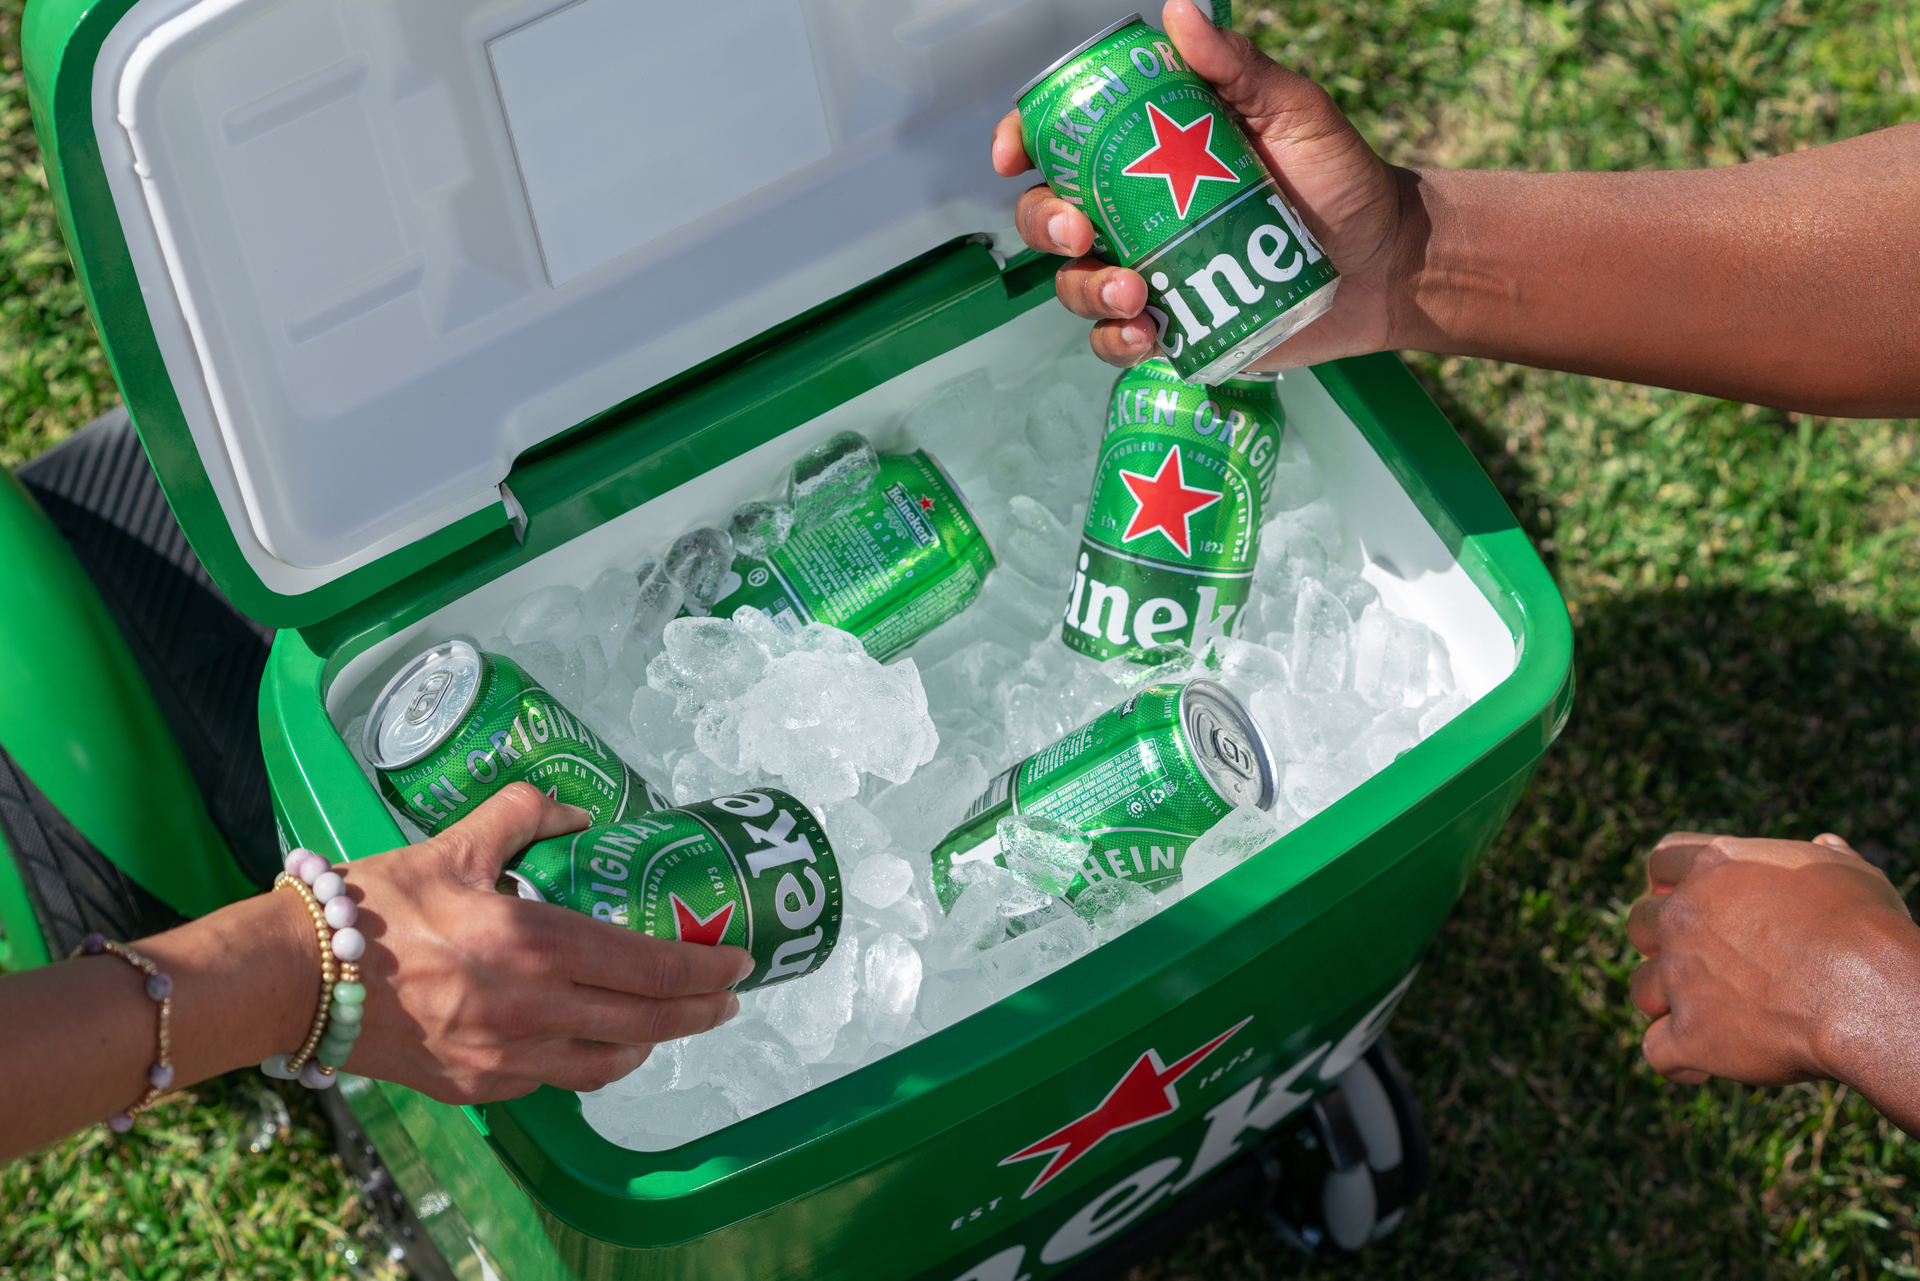 Heineken B.O.T. fot. Heineken